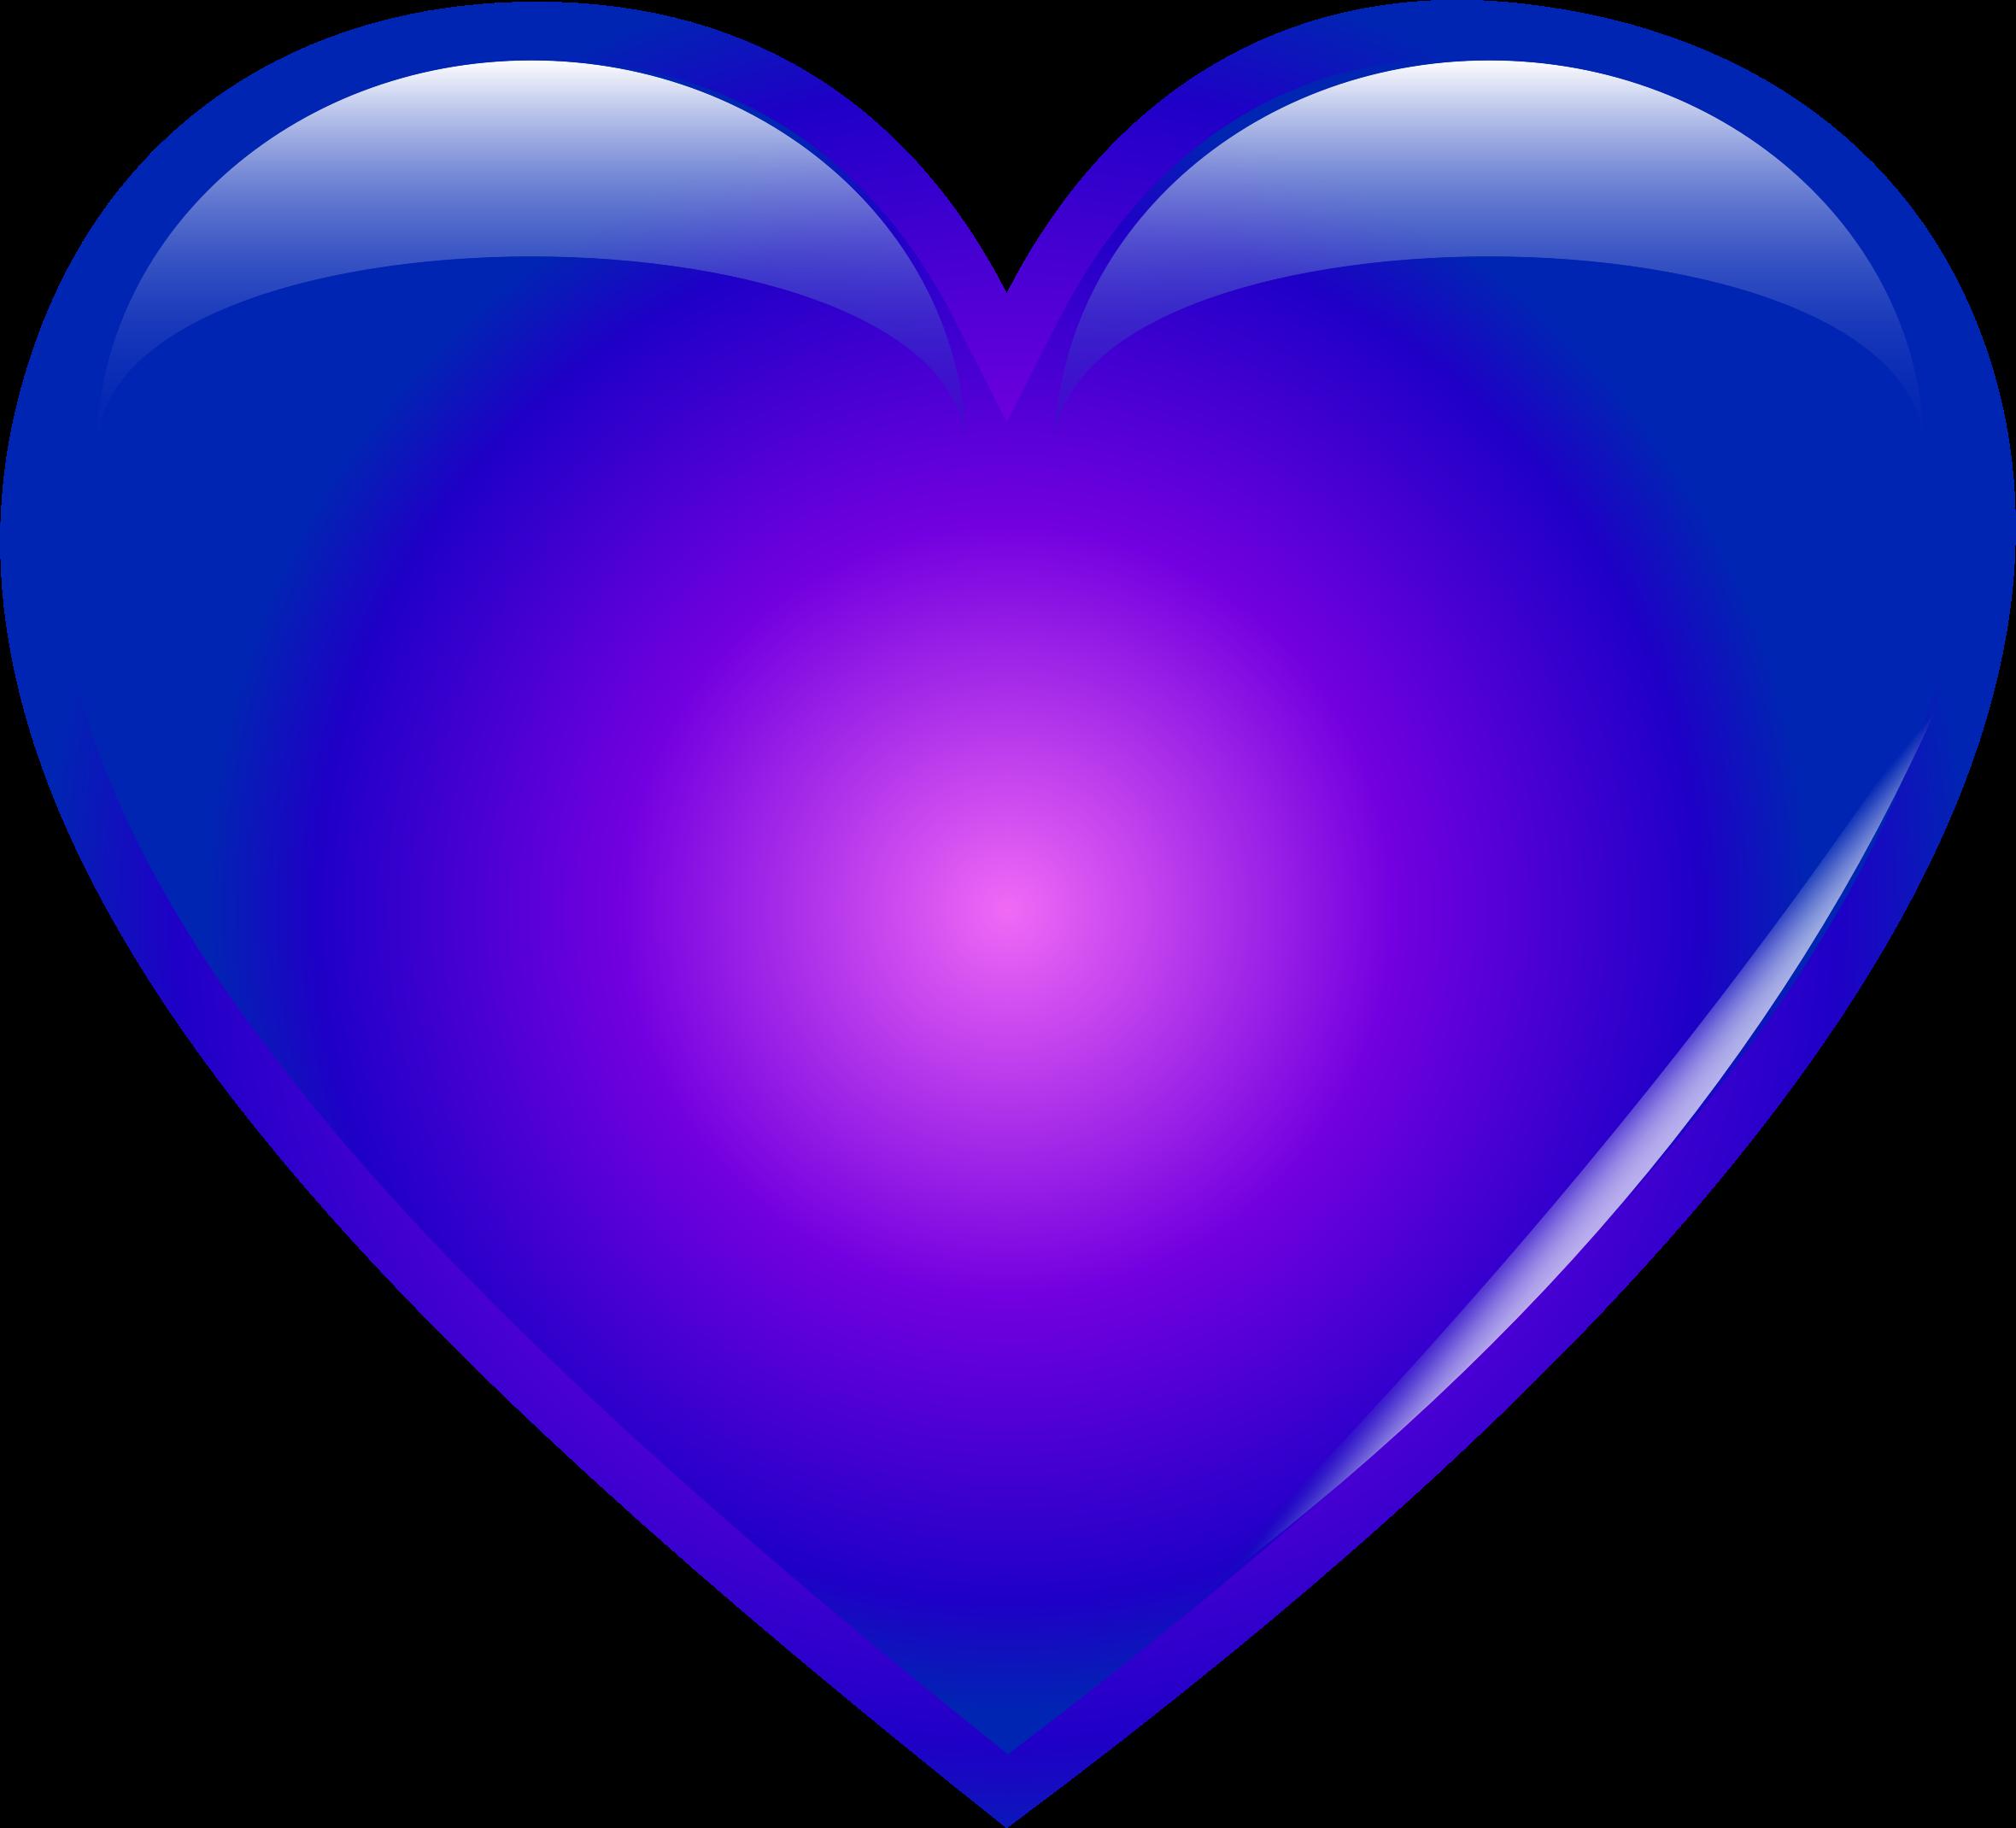 Blue clipart love heart Blue Heart Clipart Heart Blue